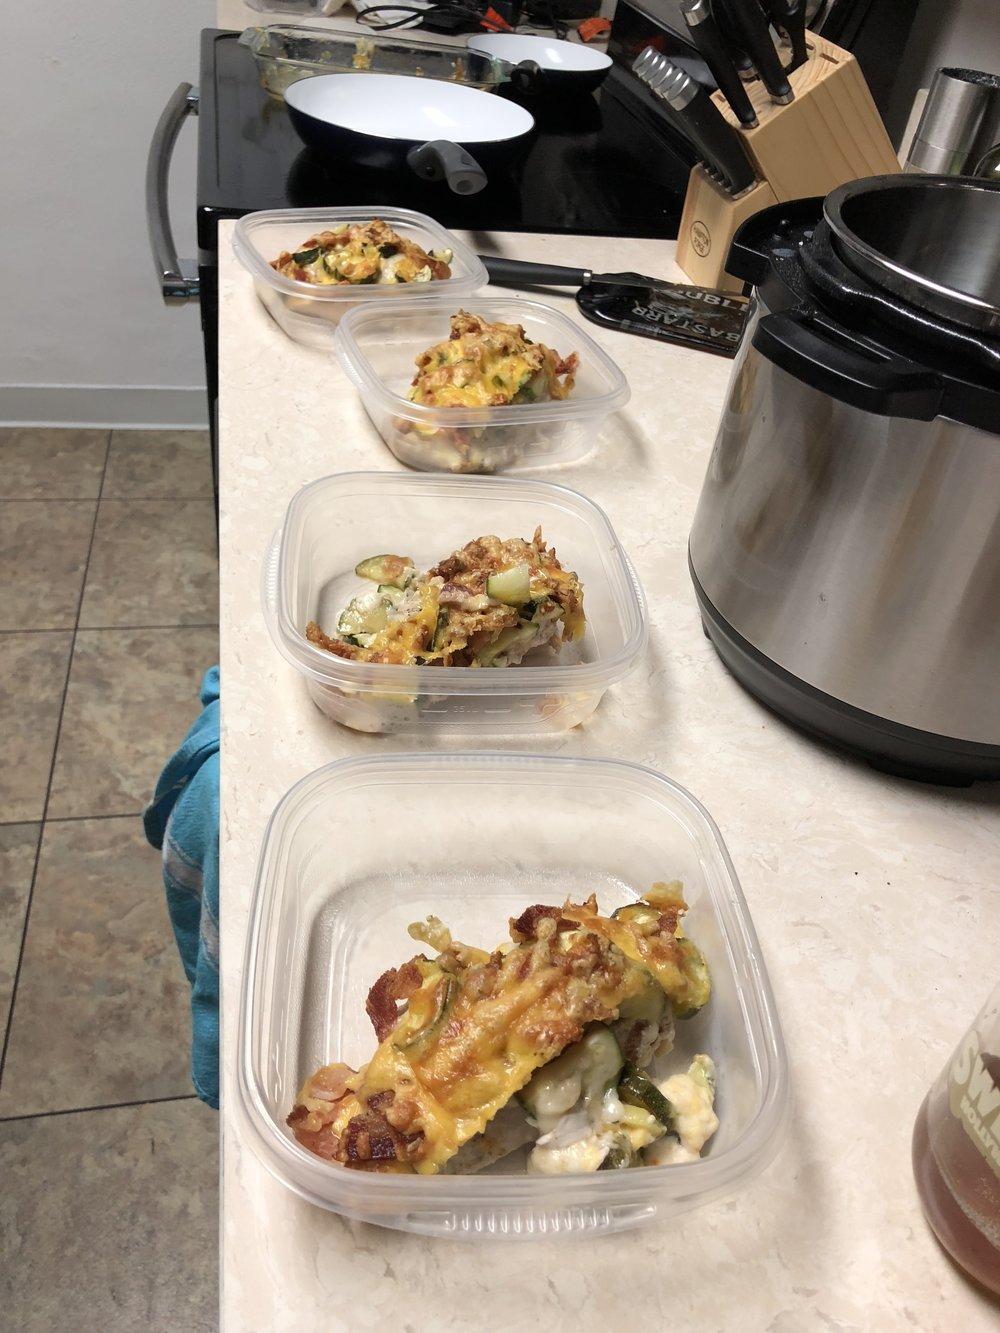 Zucchini Mozzarella Cheddar Chicken Bacon Bake